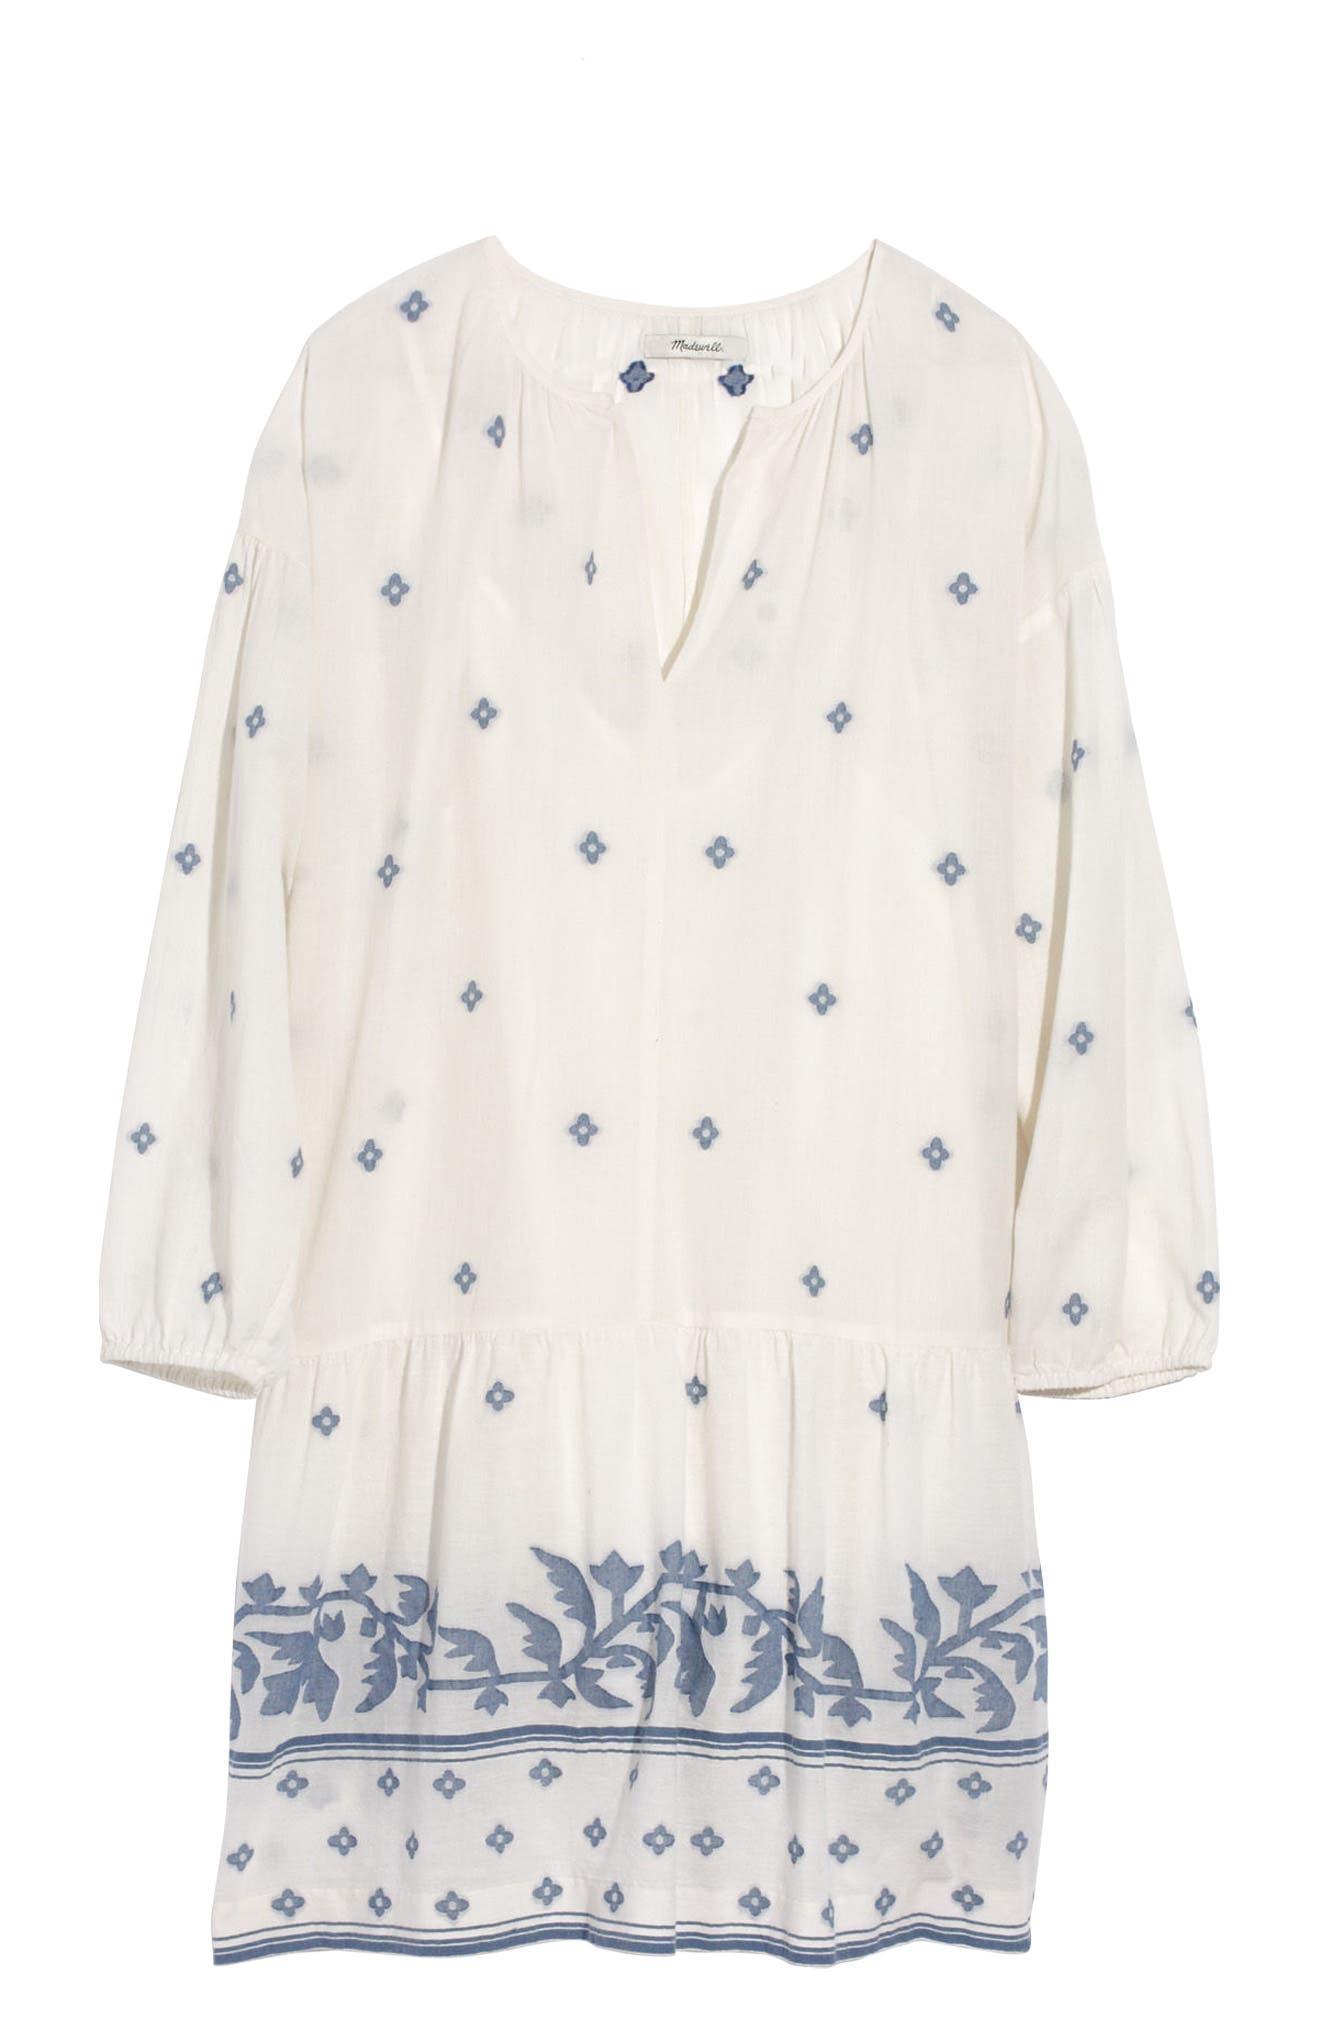 Madewell Primrose Jacquard Tunic Dress